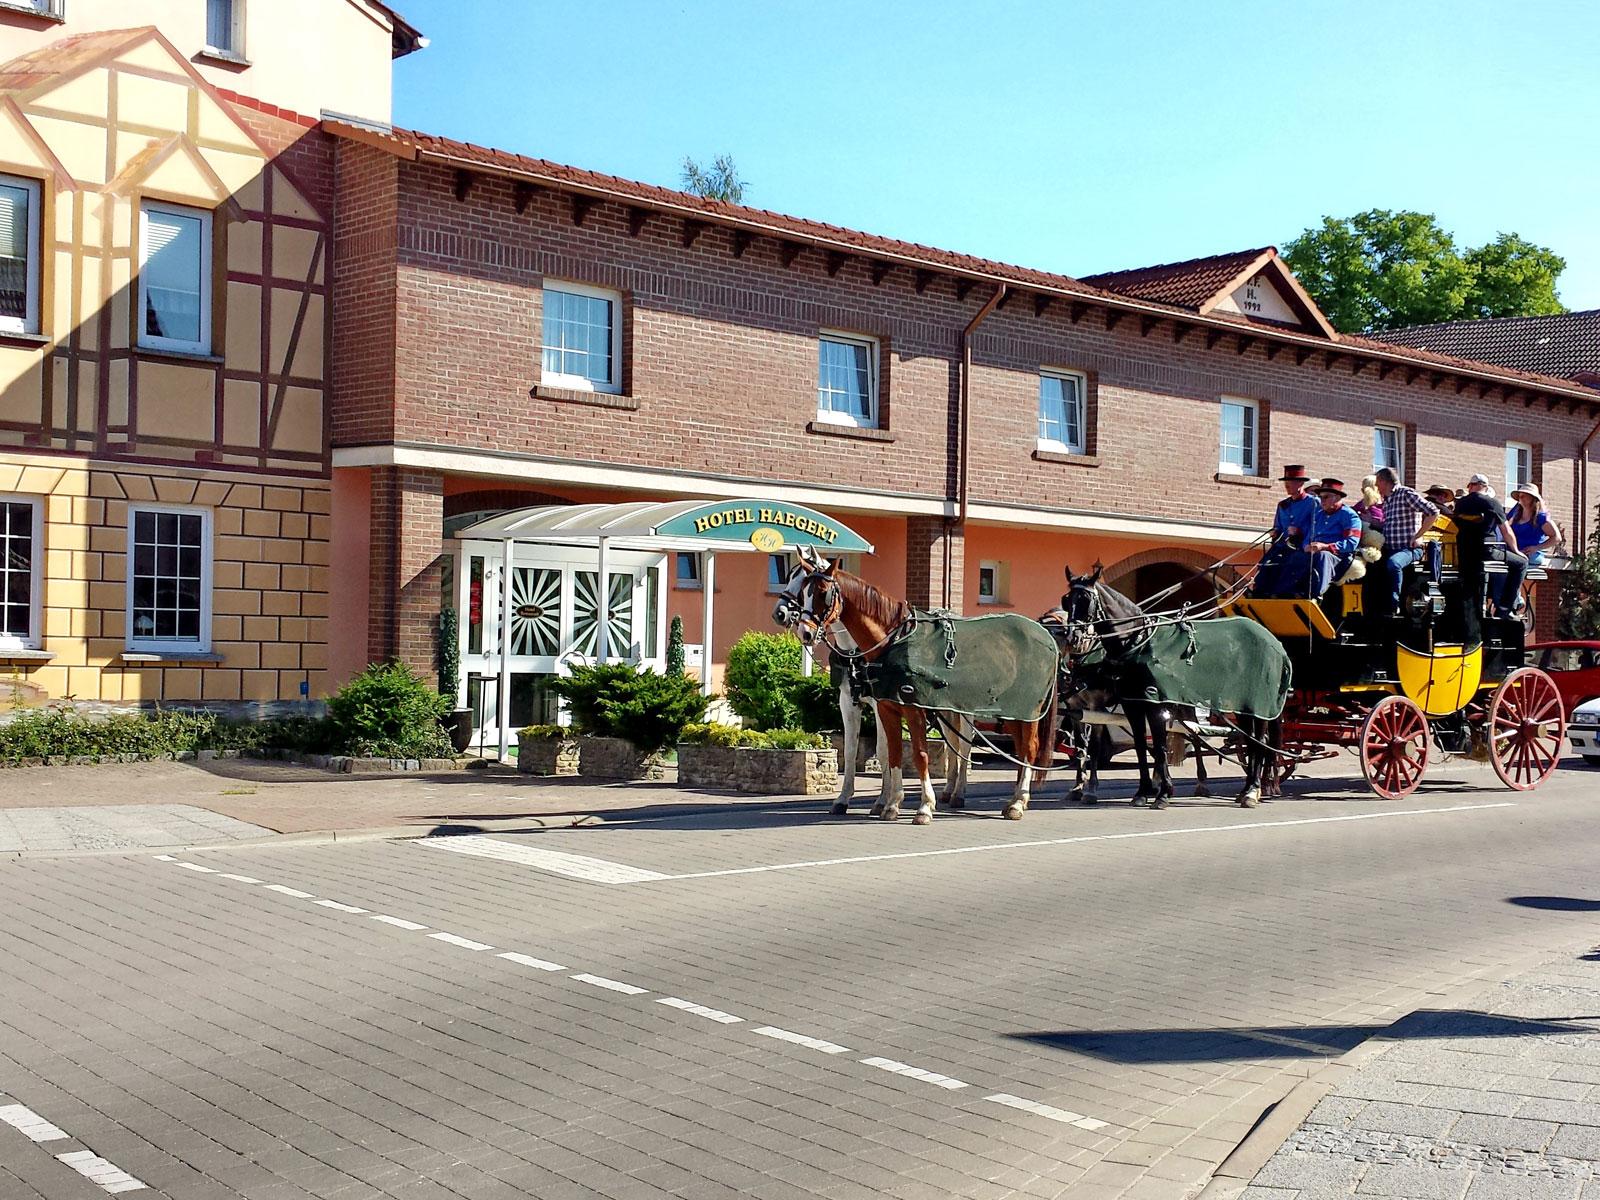 Hotel Haegert